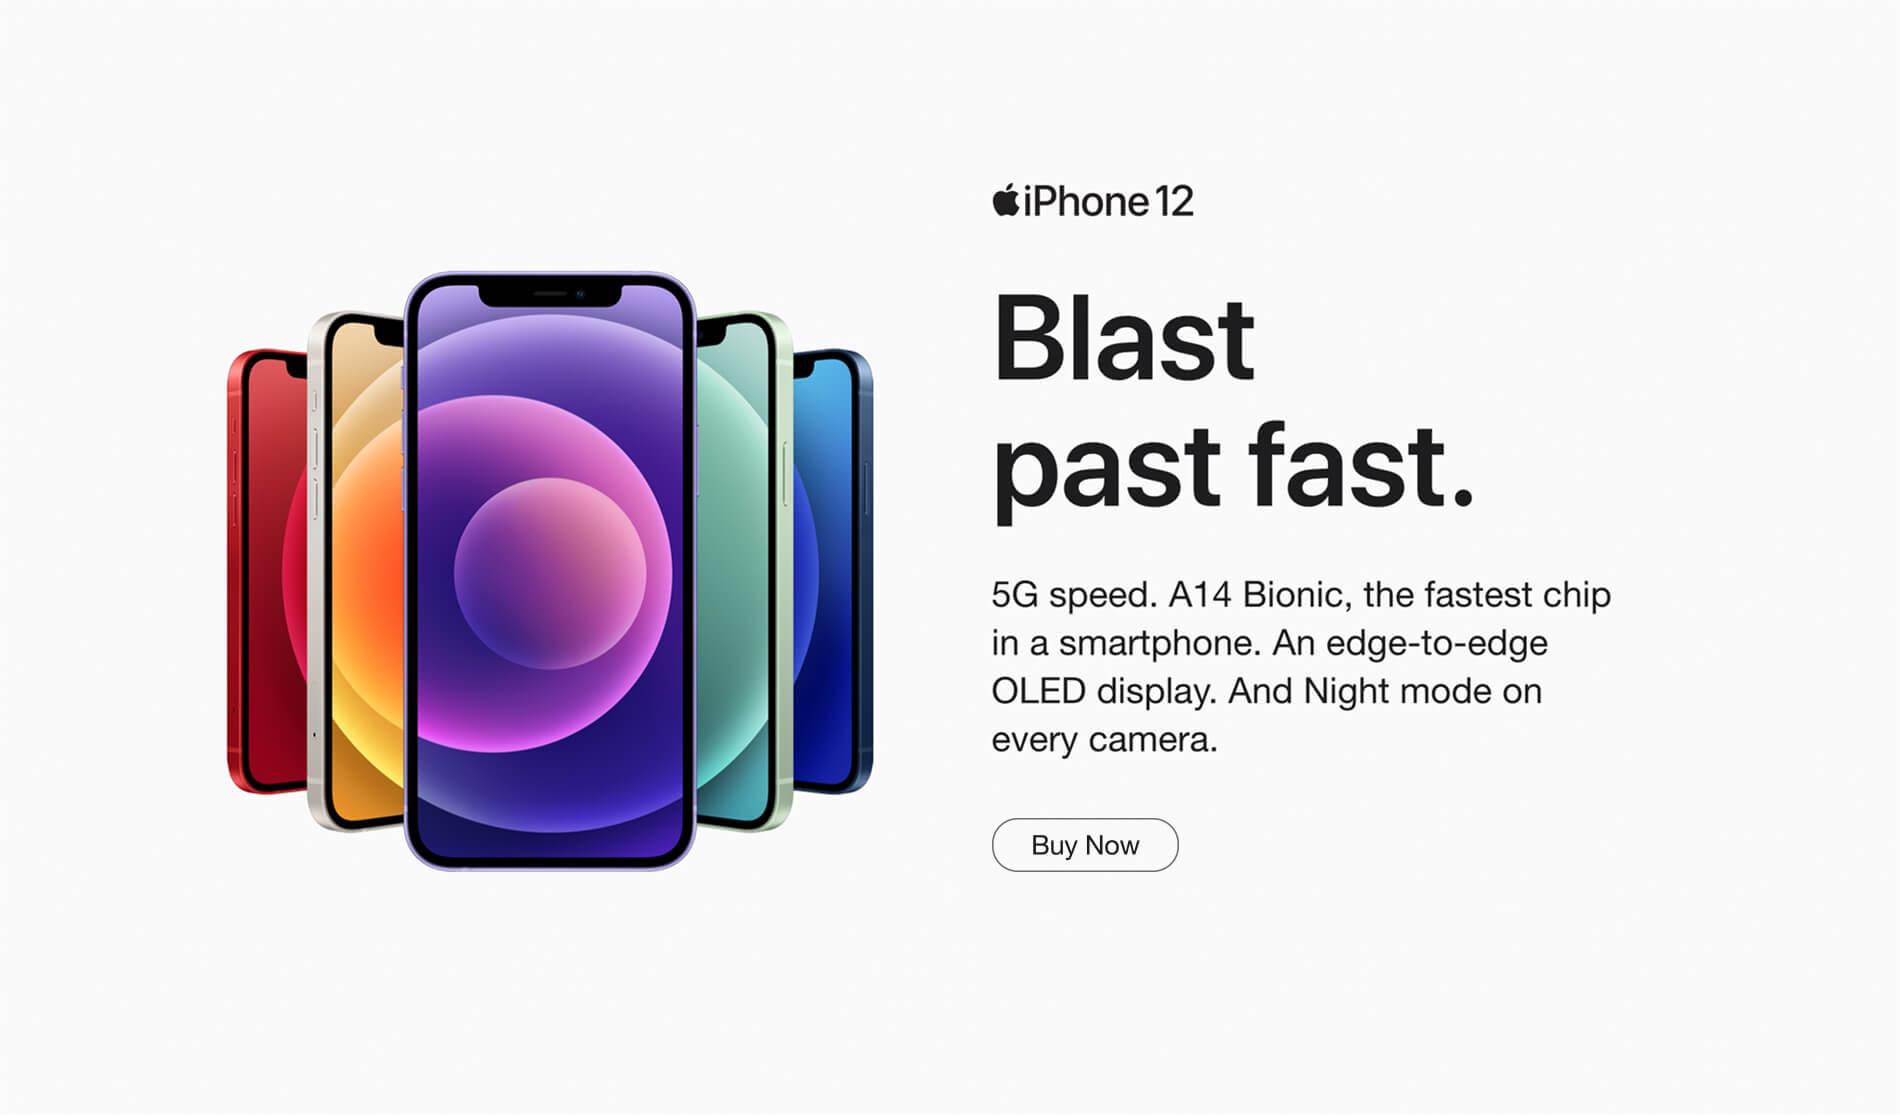 iPhone 12. Blast past fast. Buy Now